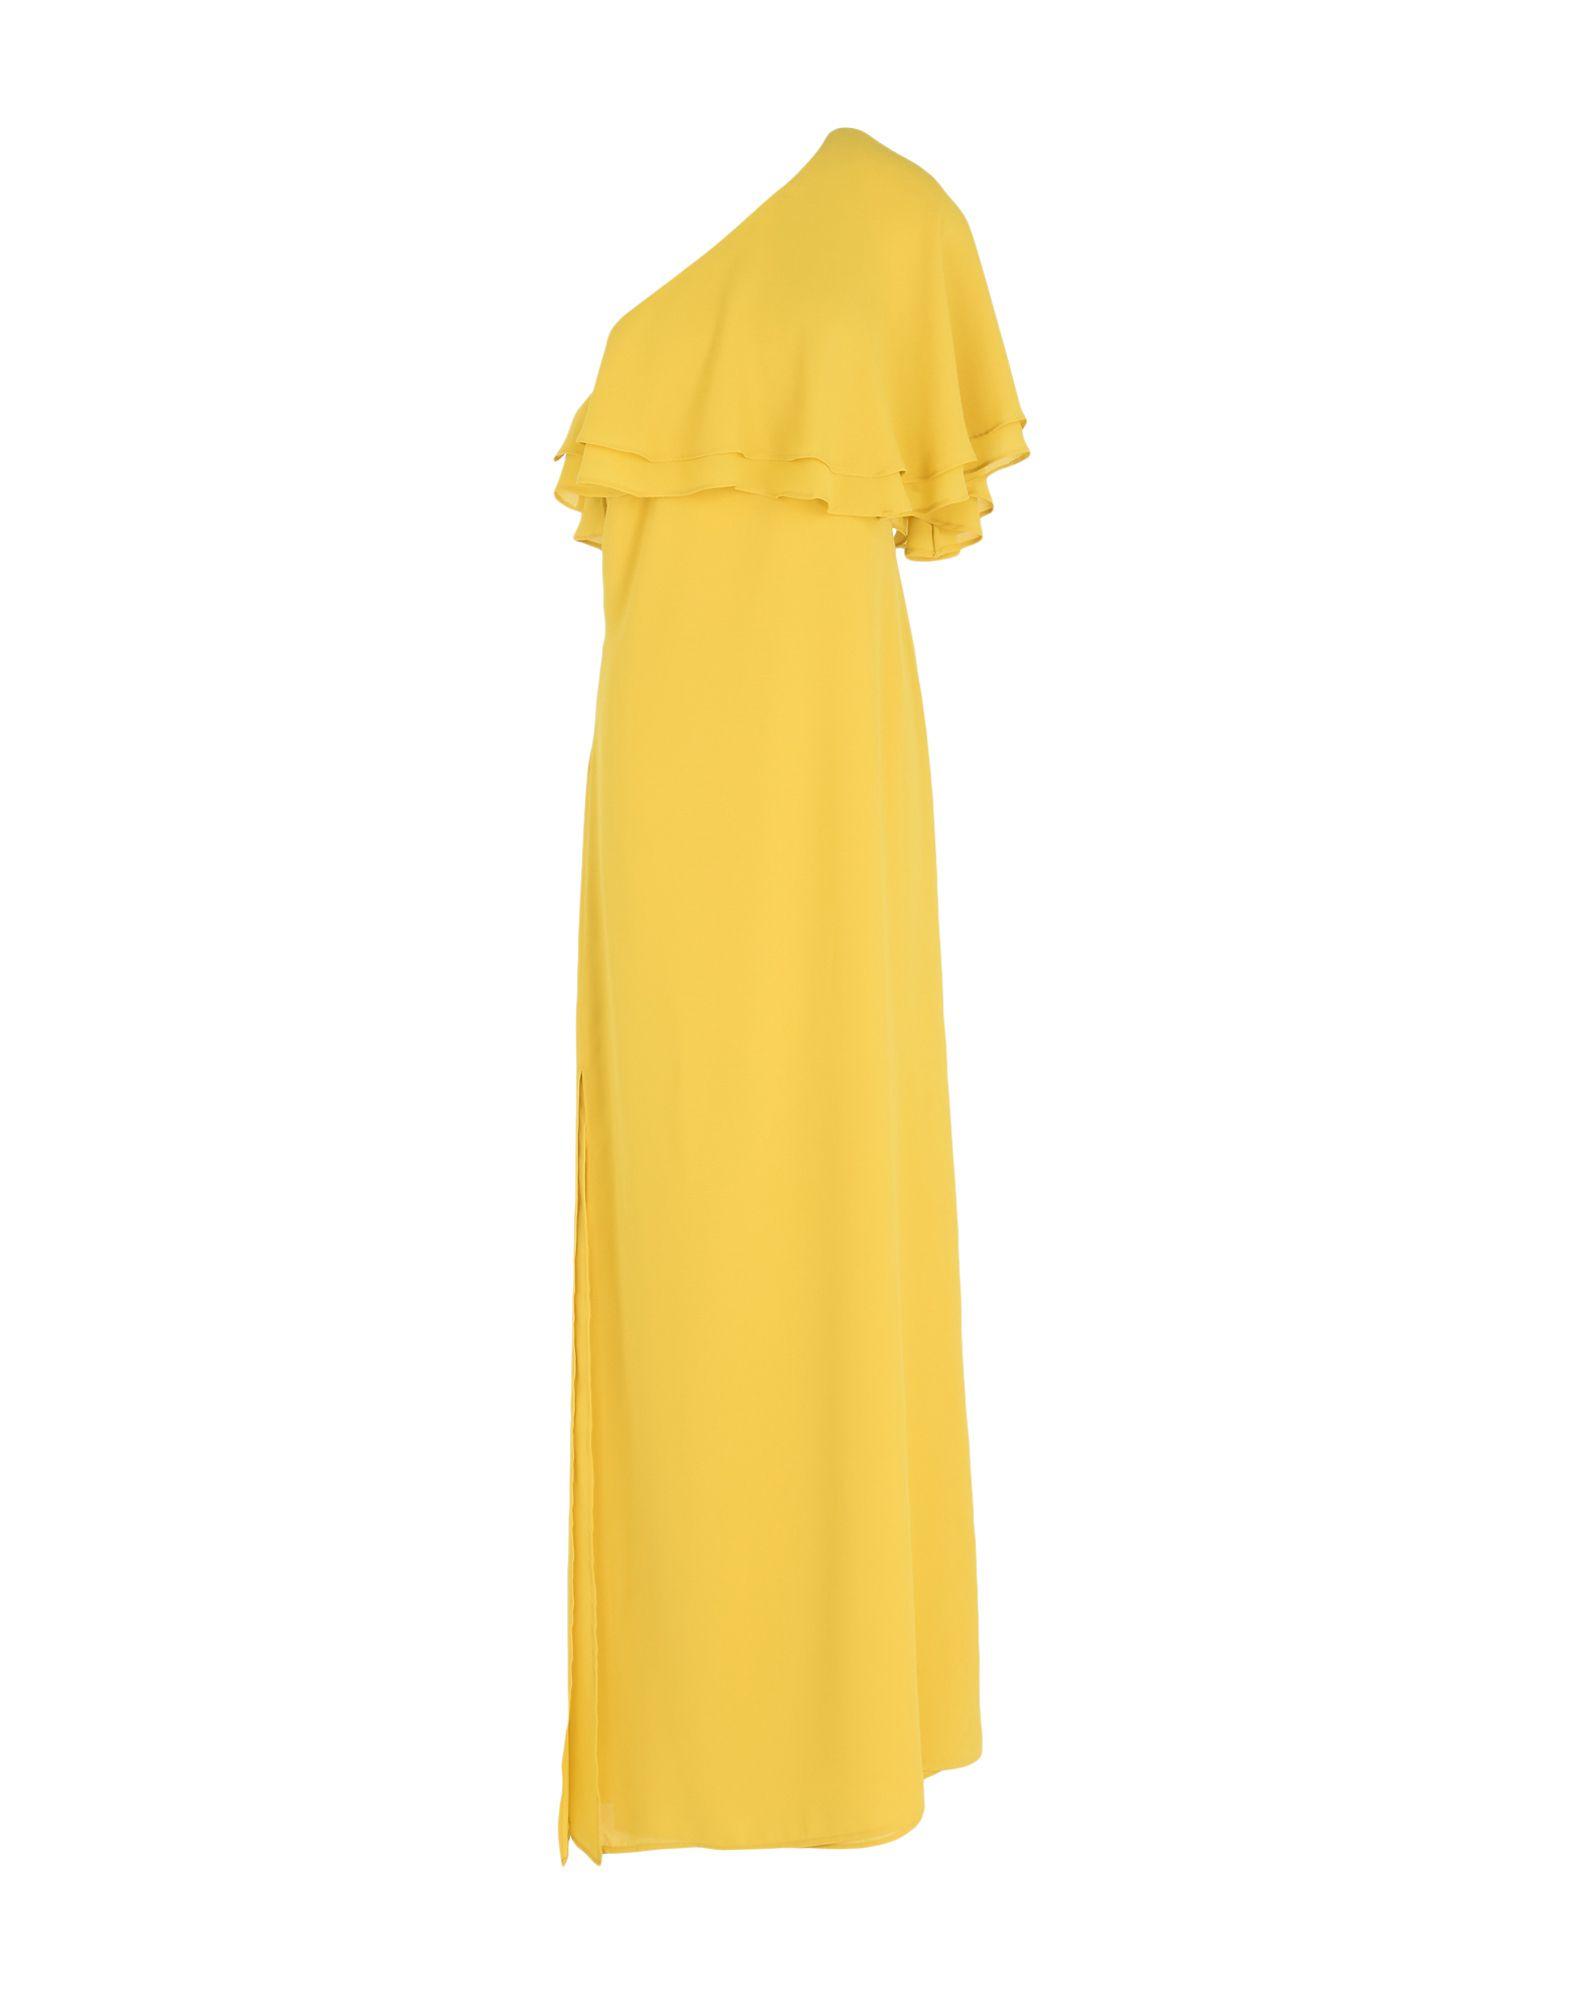 KI6? WHO ARE YOU? Damen Langes Kleid Farbe Gelb Größe 4